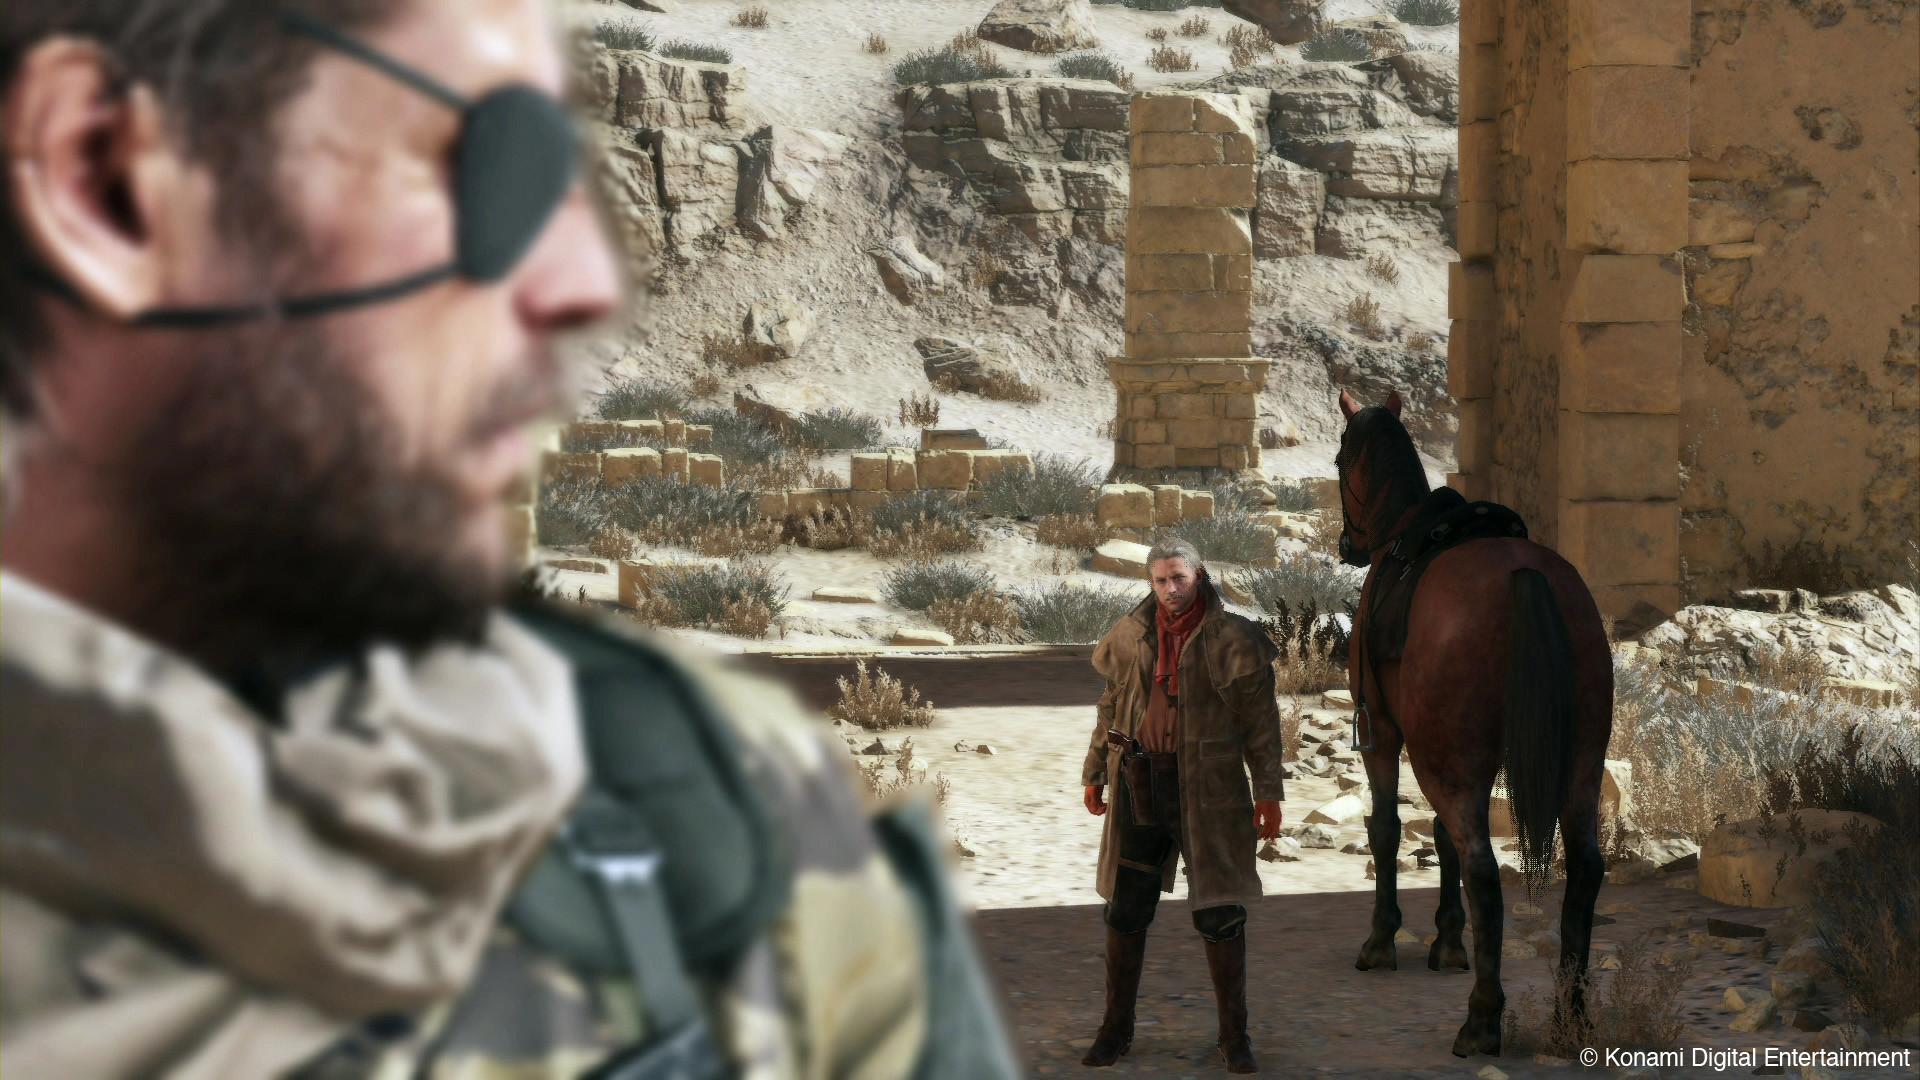 Metal-Gear-Solid-5-Desktop-Background-Wallpaper